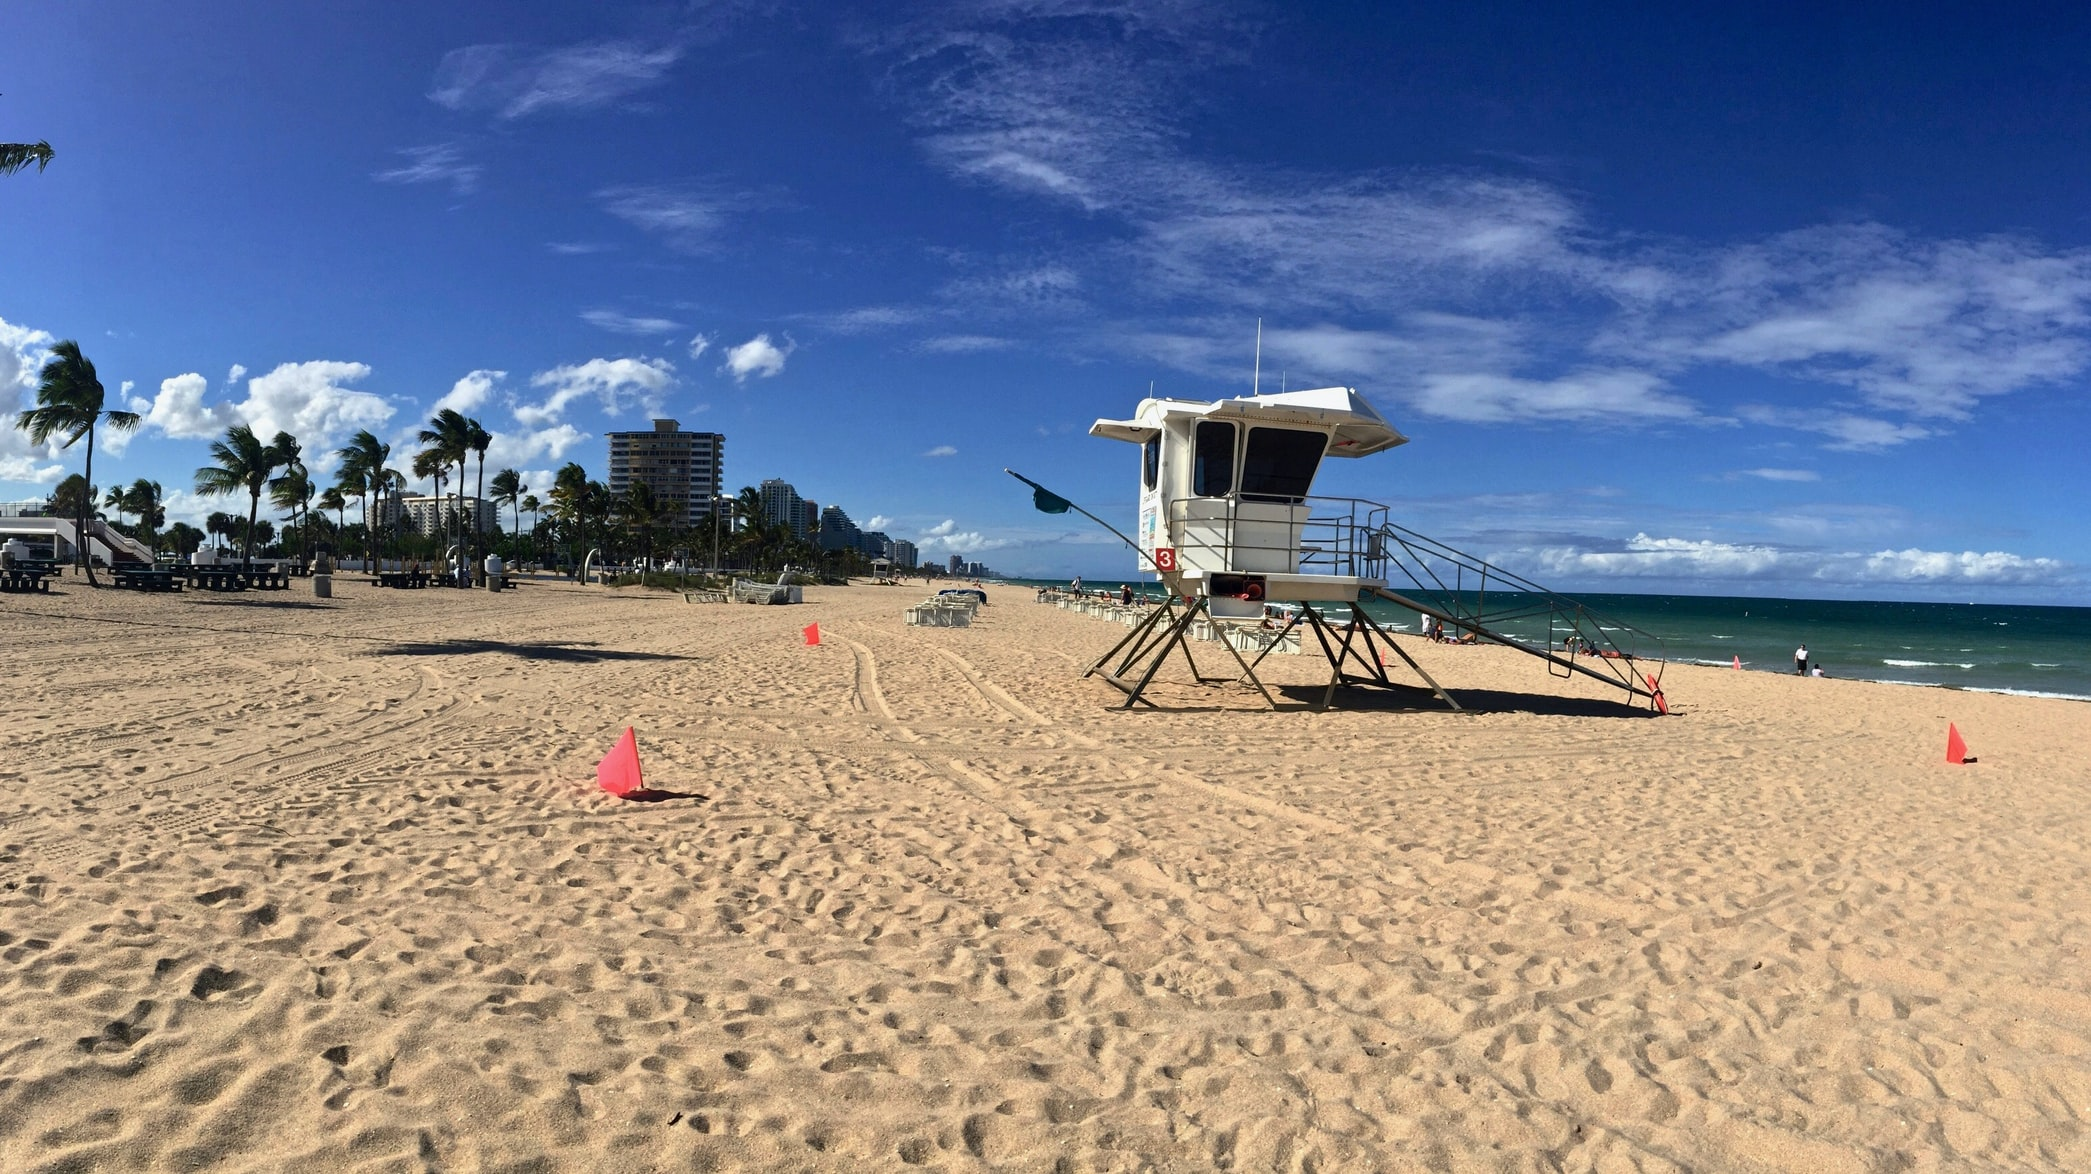 sandy beach in Fort Lauderdale, FL